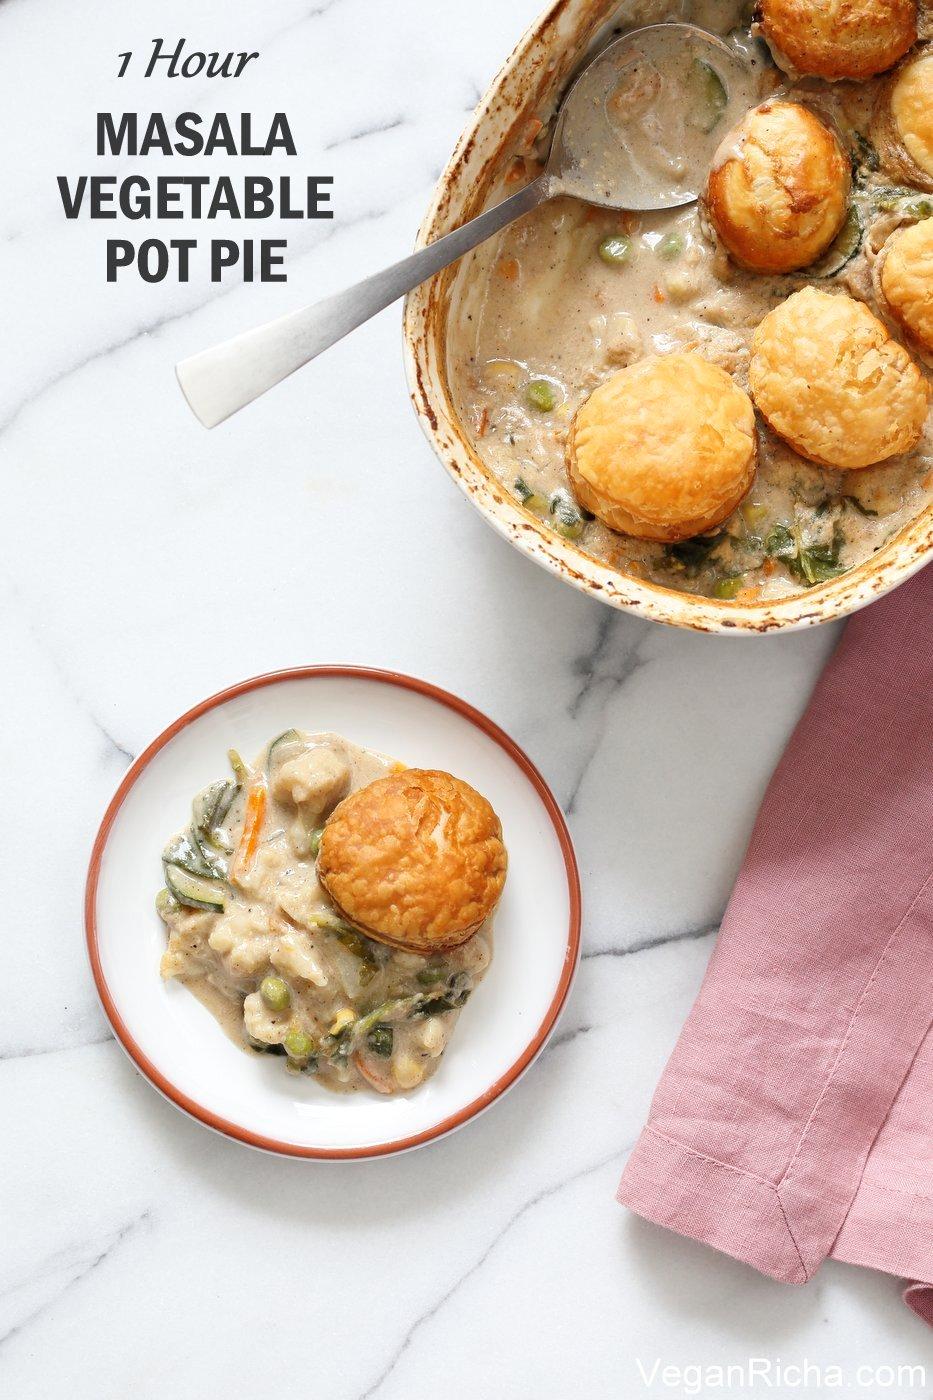 1 Hour Masala Vegetable Pot Pie Vegan Richa Recipe In 2020 Vegetable Pot Pies Recipes Vegetarian Pot Pie